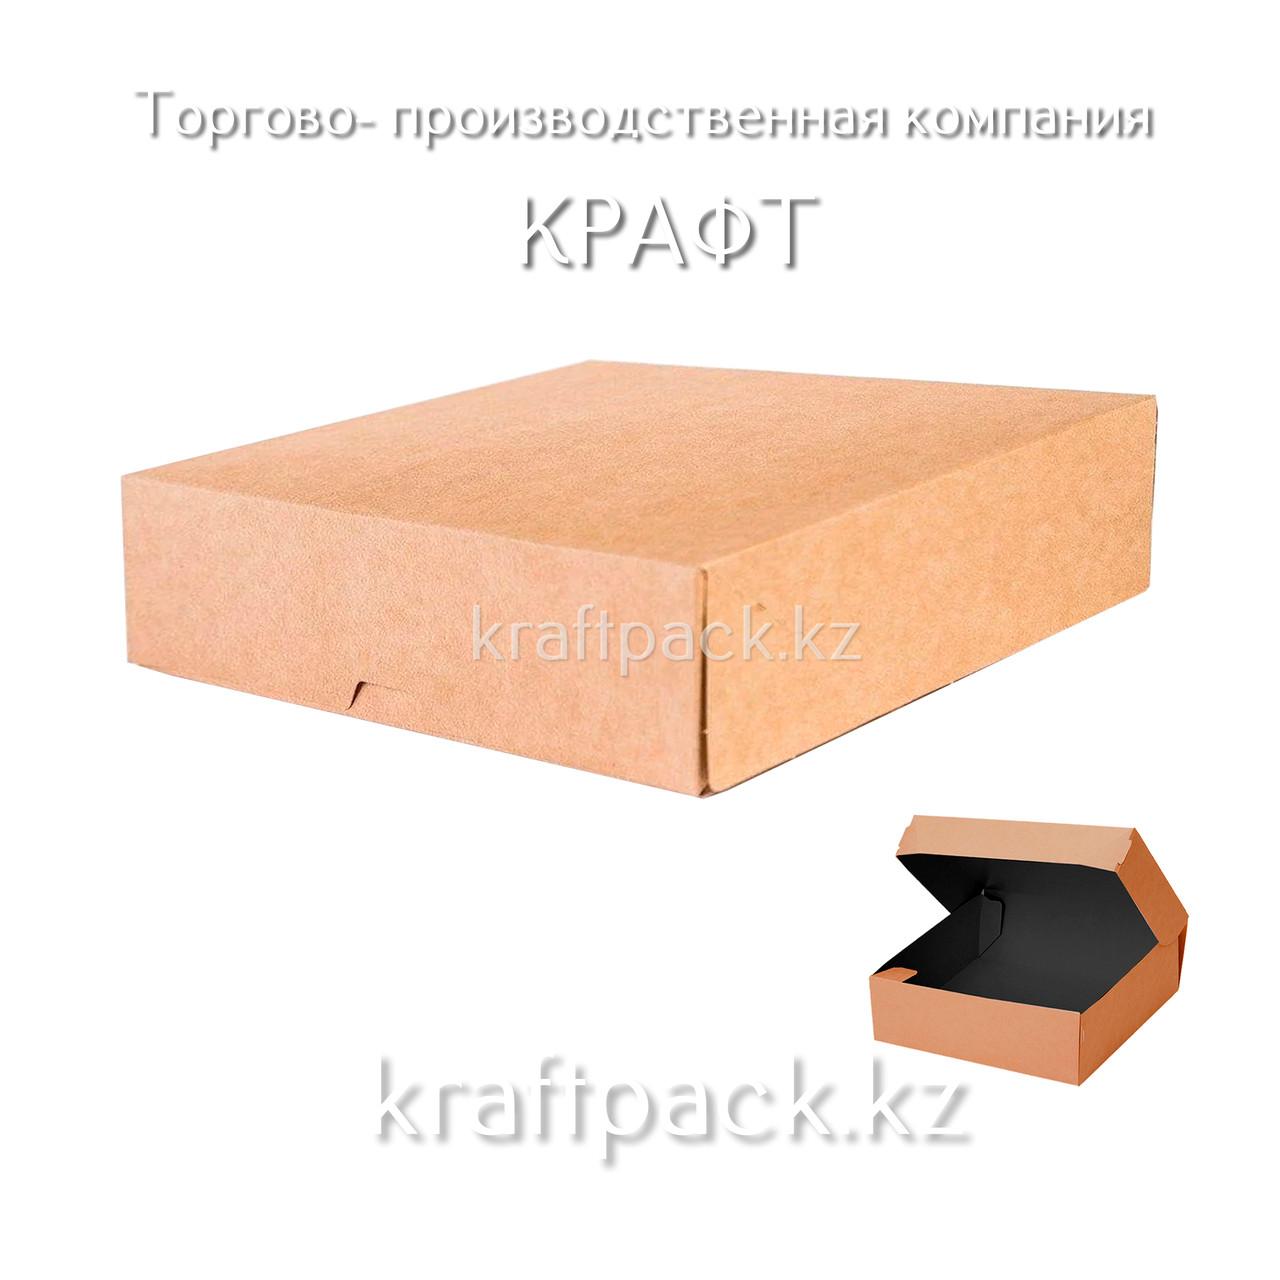 (Eco Tabox PRO 1500 BE) Коробка (Без окна) 200*200*40 Black Edition DoEco (25/125)